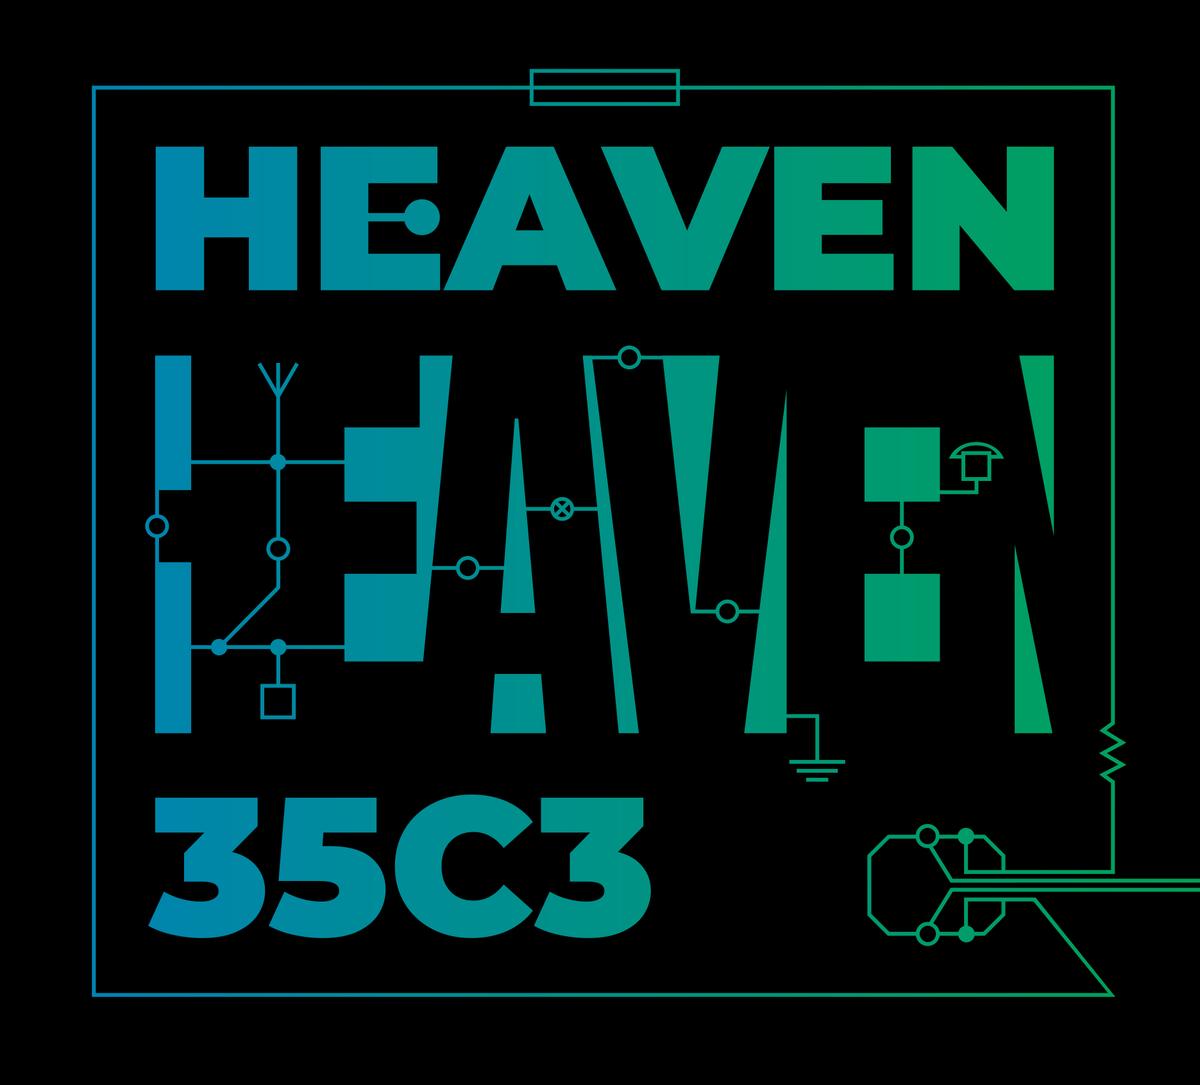 35c3 Heaven Logo